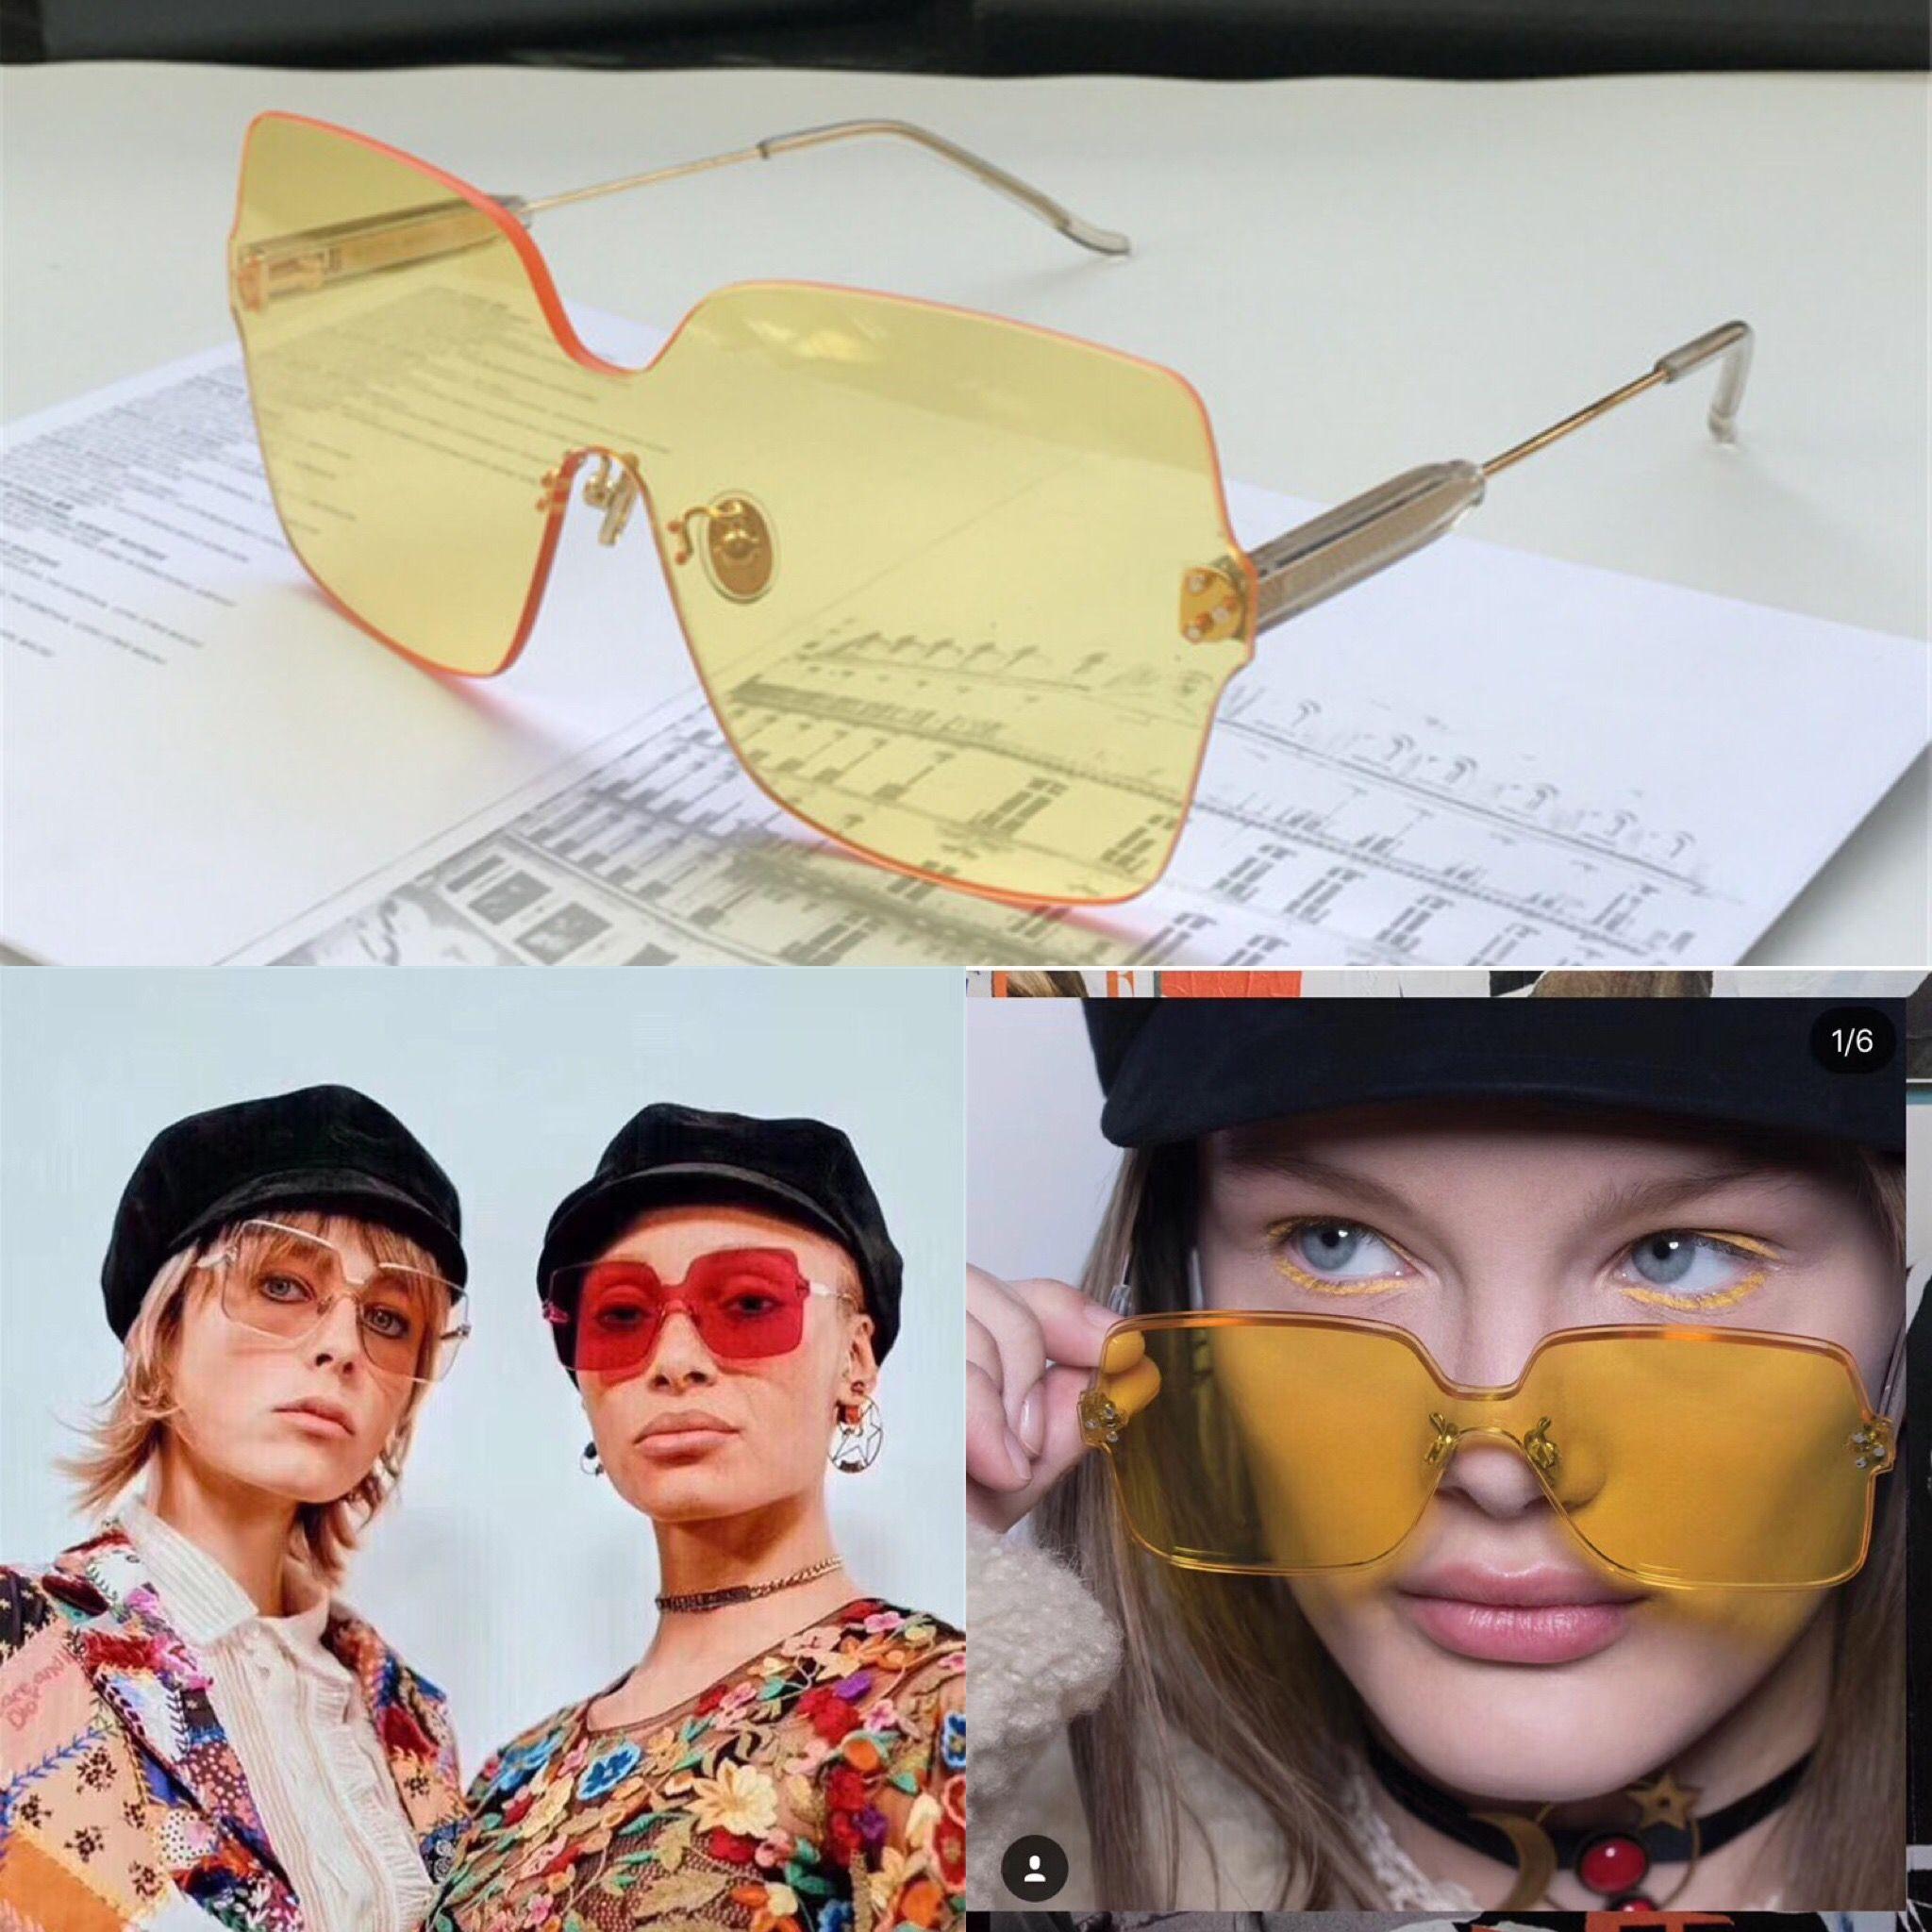 75df1abd841 New Fashion Designer Sunglasses ADCICT 2 Square Frameless Popular Style  Summer Candy Color Lenses Uv400 Protection Ornamental Eyewear Sunglasses  Shop Bolle ...